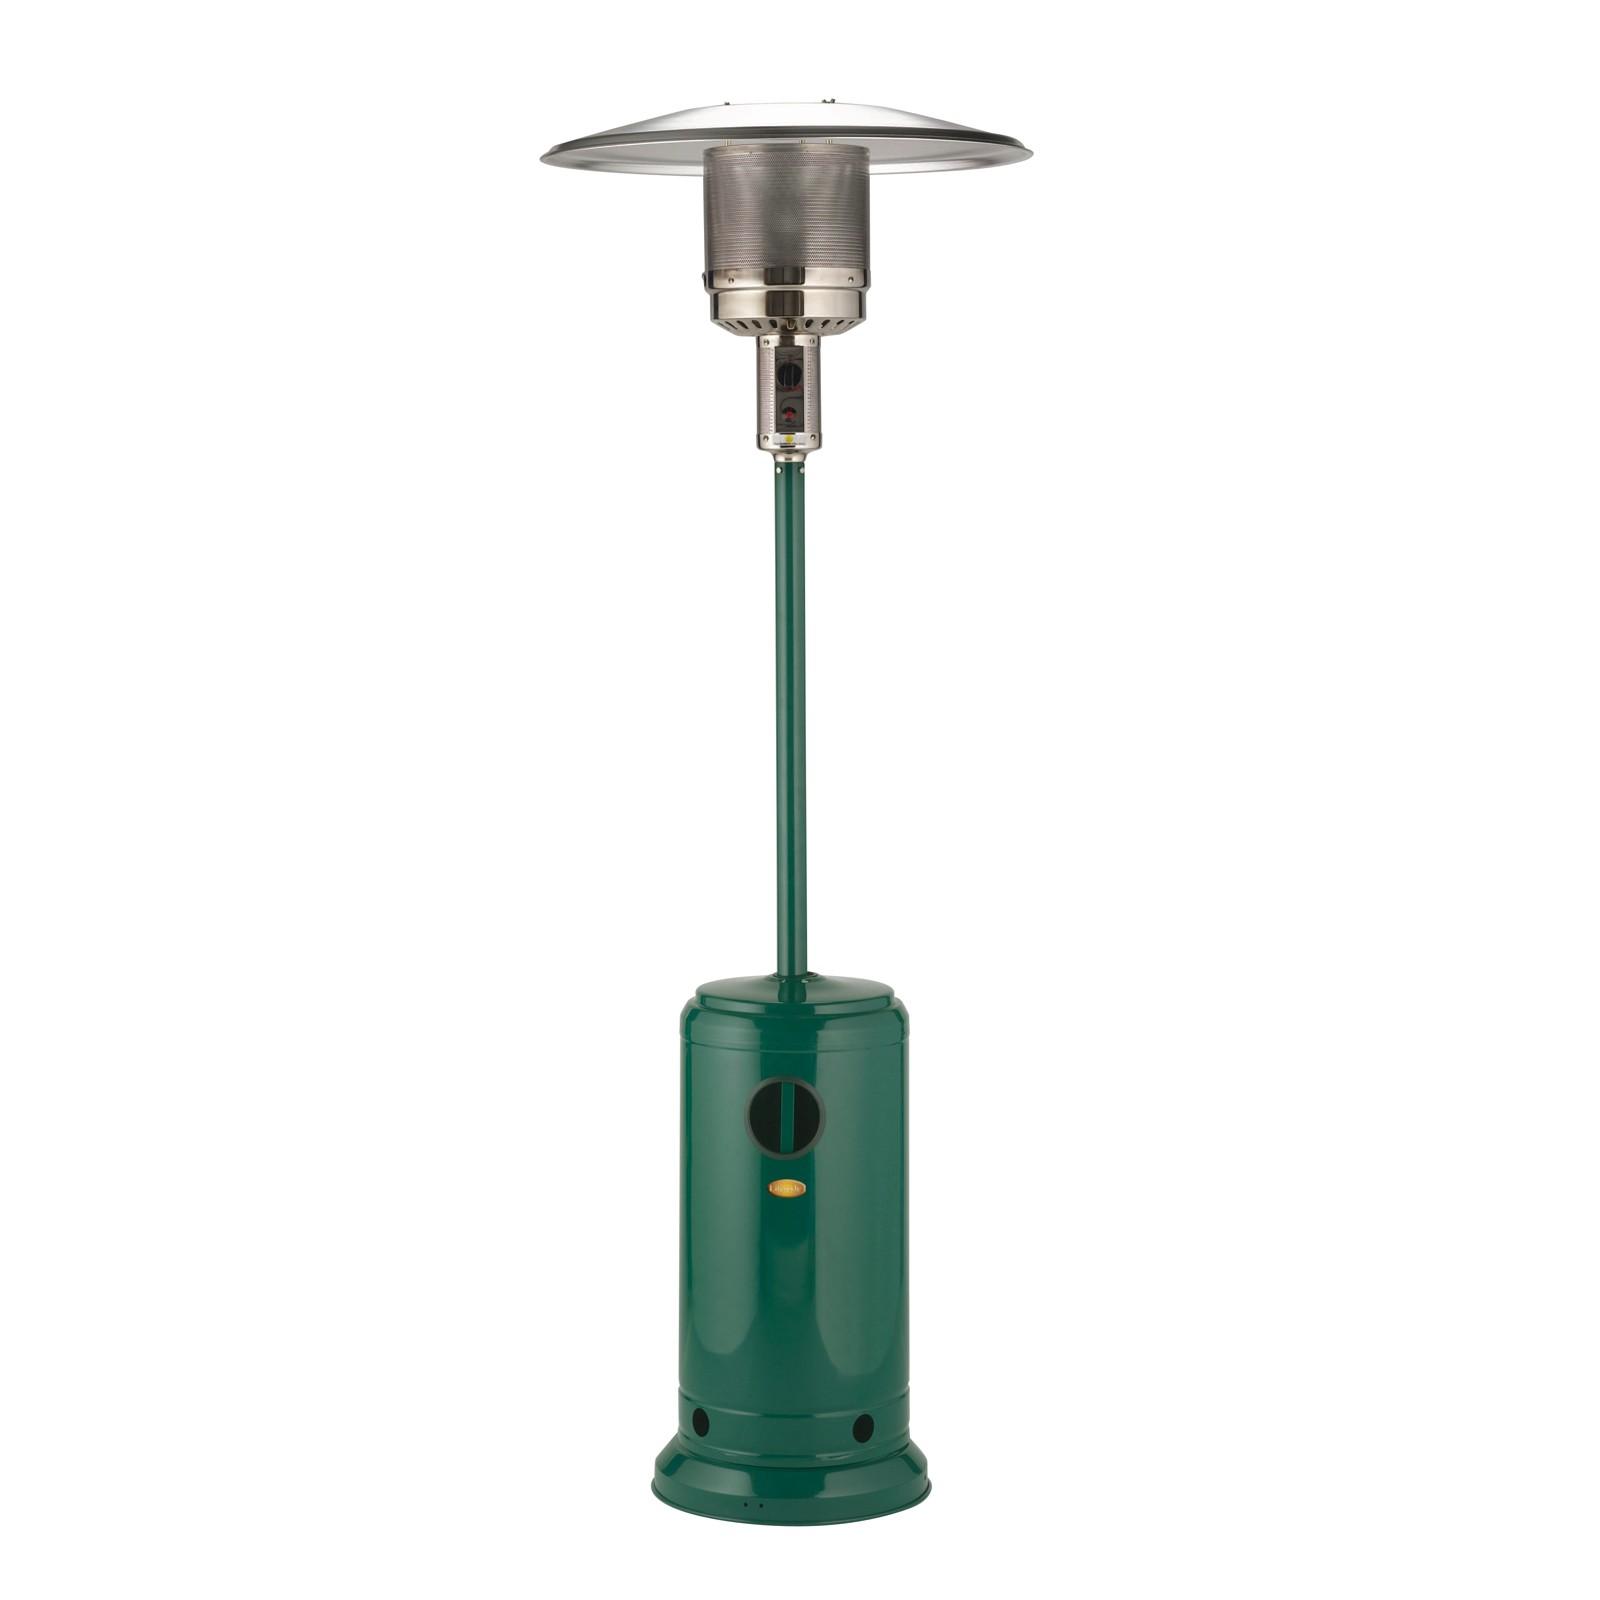 canada heater halogen larger lowe view patio umbrella fire accessories a sense s